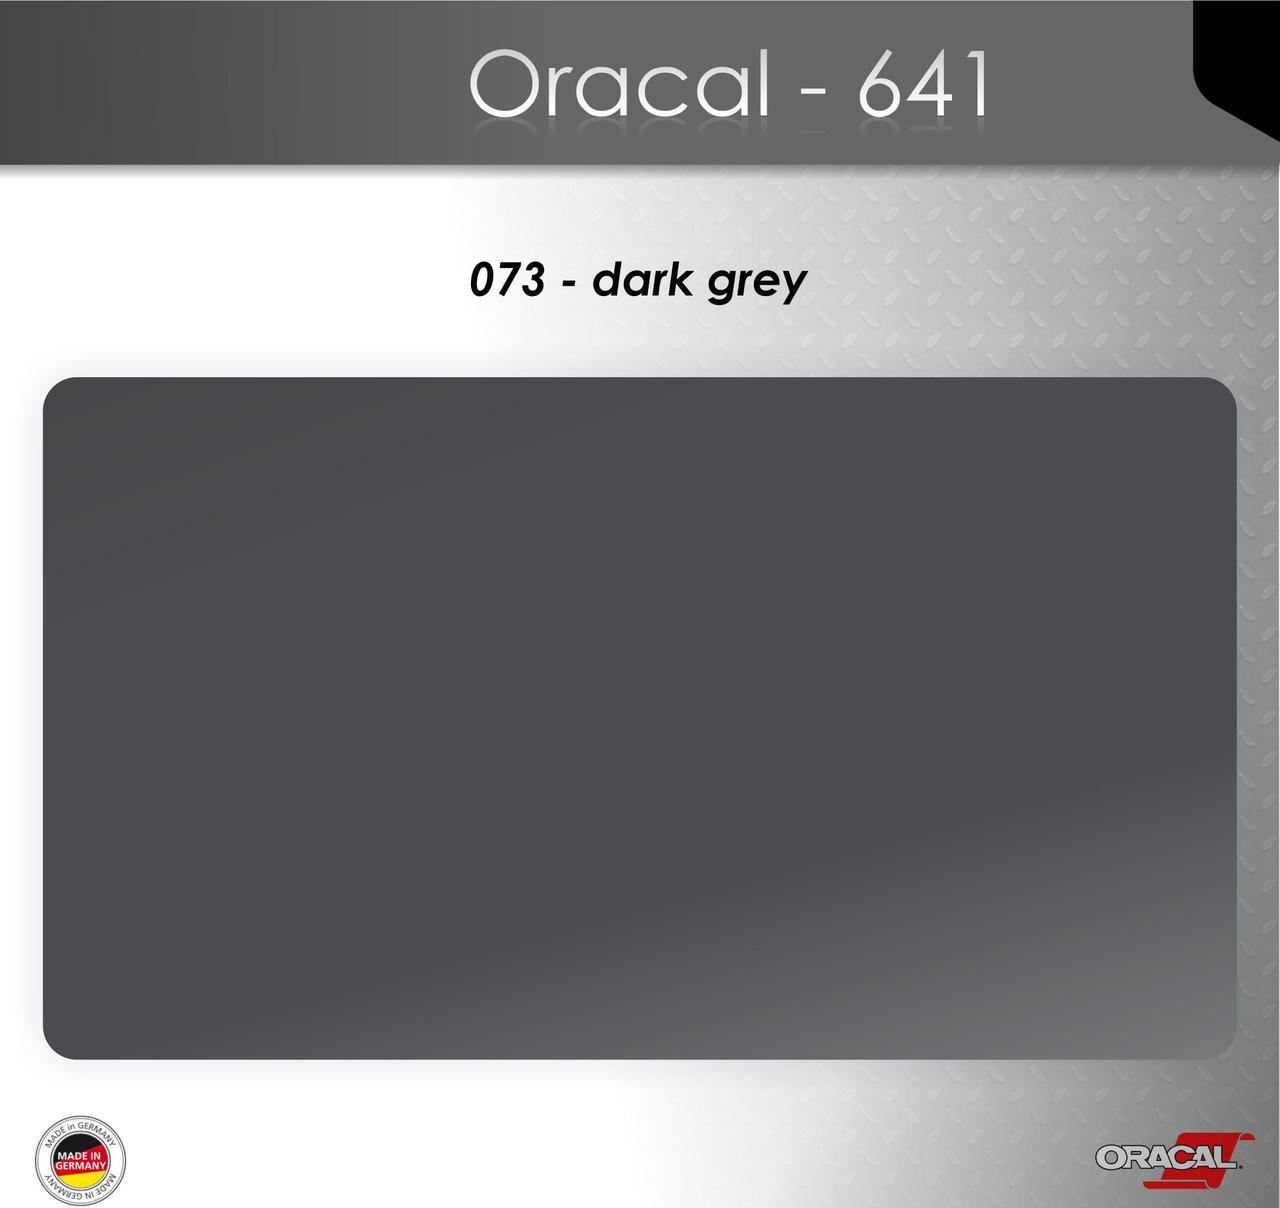 Пленка Оракал 641/темно-серый (073)